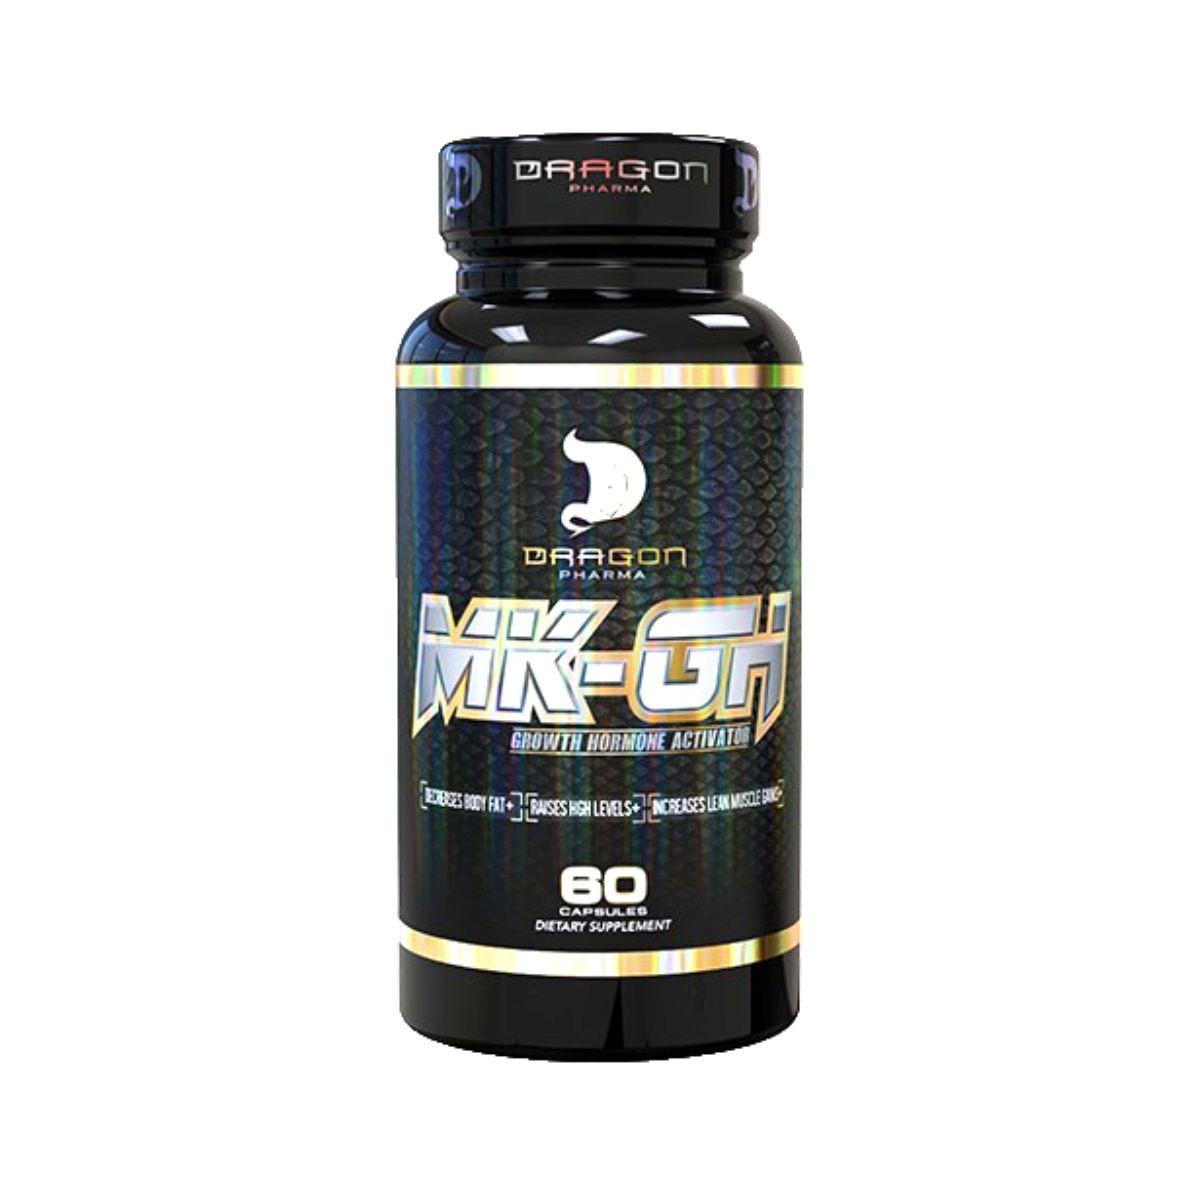 Sarm MK GH (MK677) 12,5mg 60 Caps - Dragon Pharma